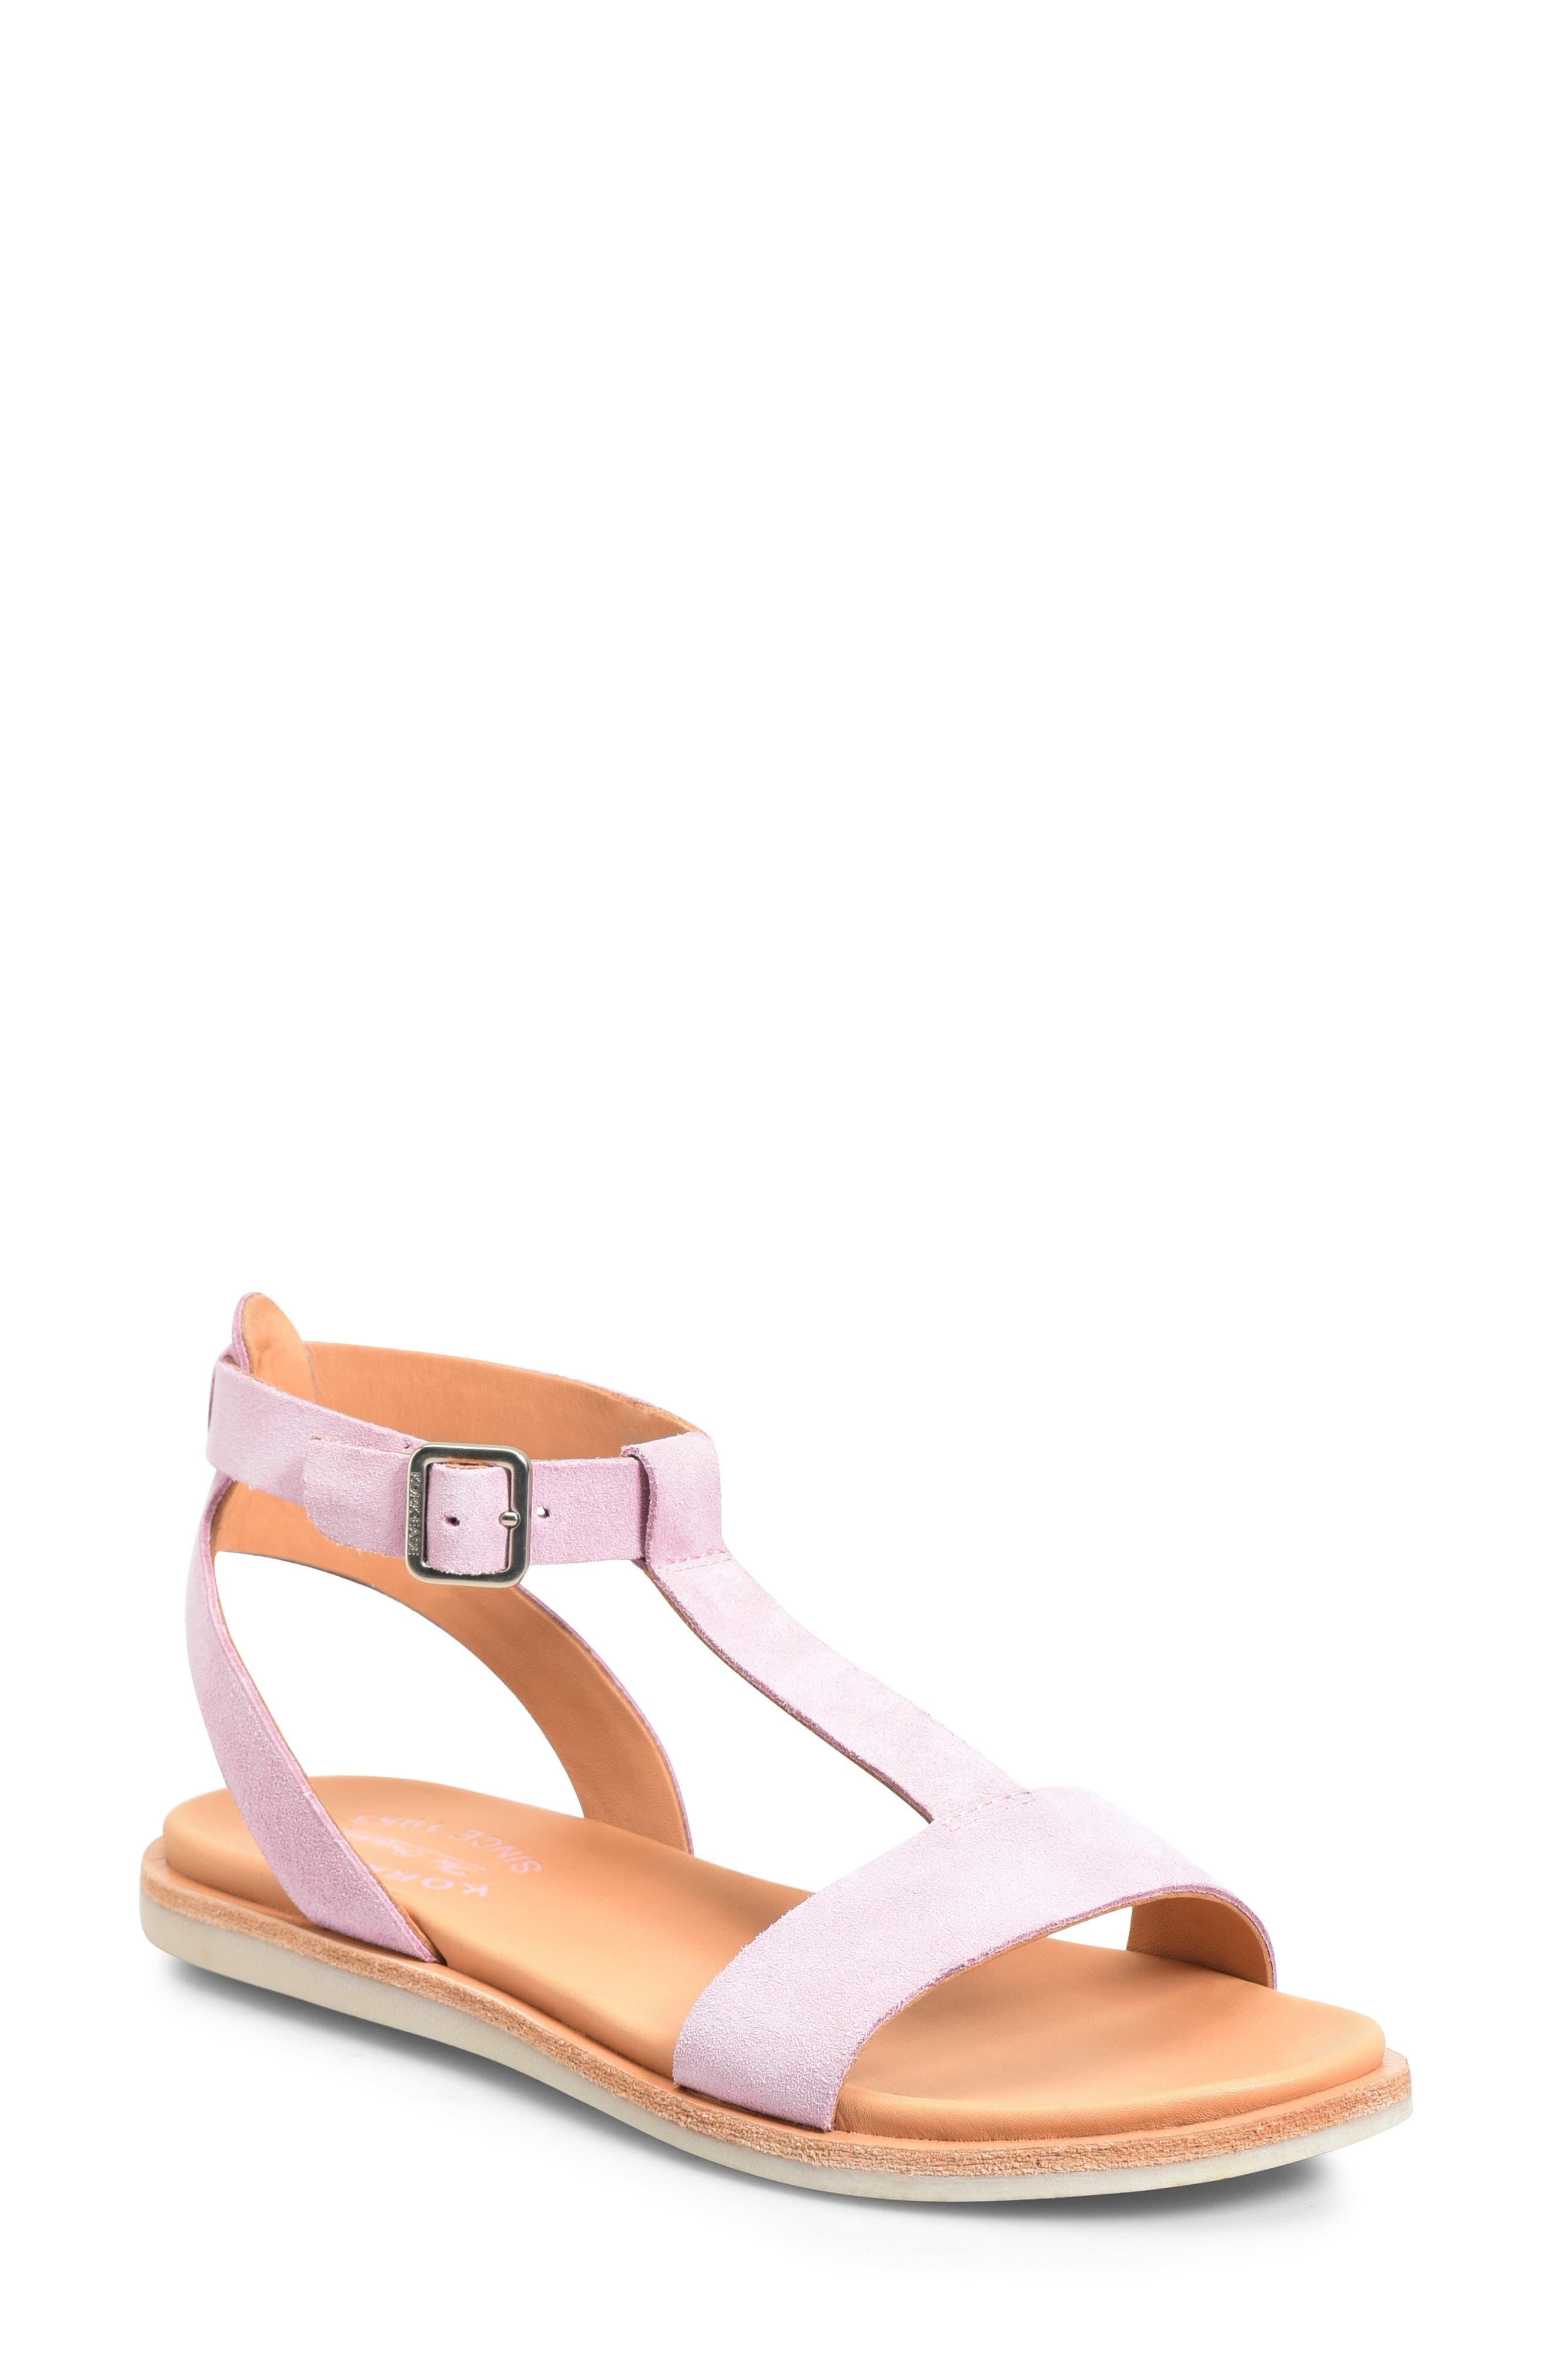 Kork-Ease Zukey T-Strap Sandal, Pink